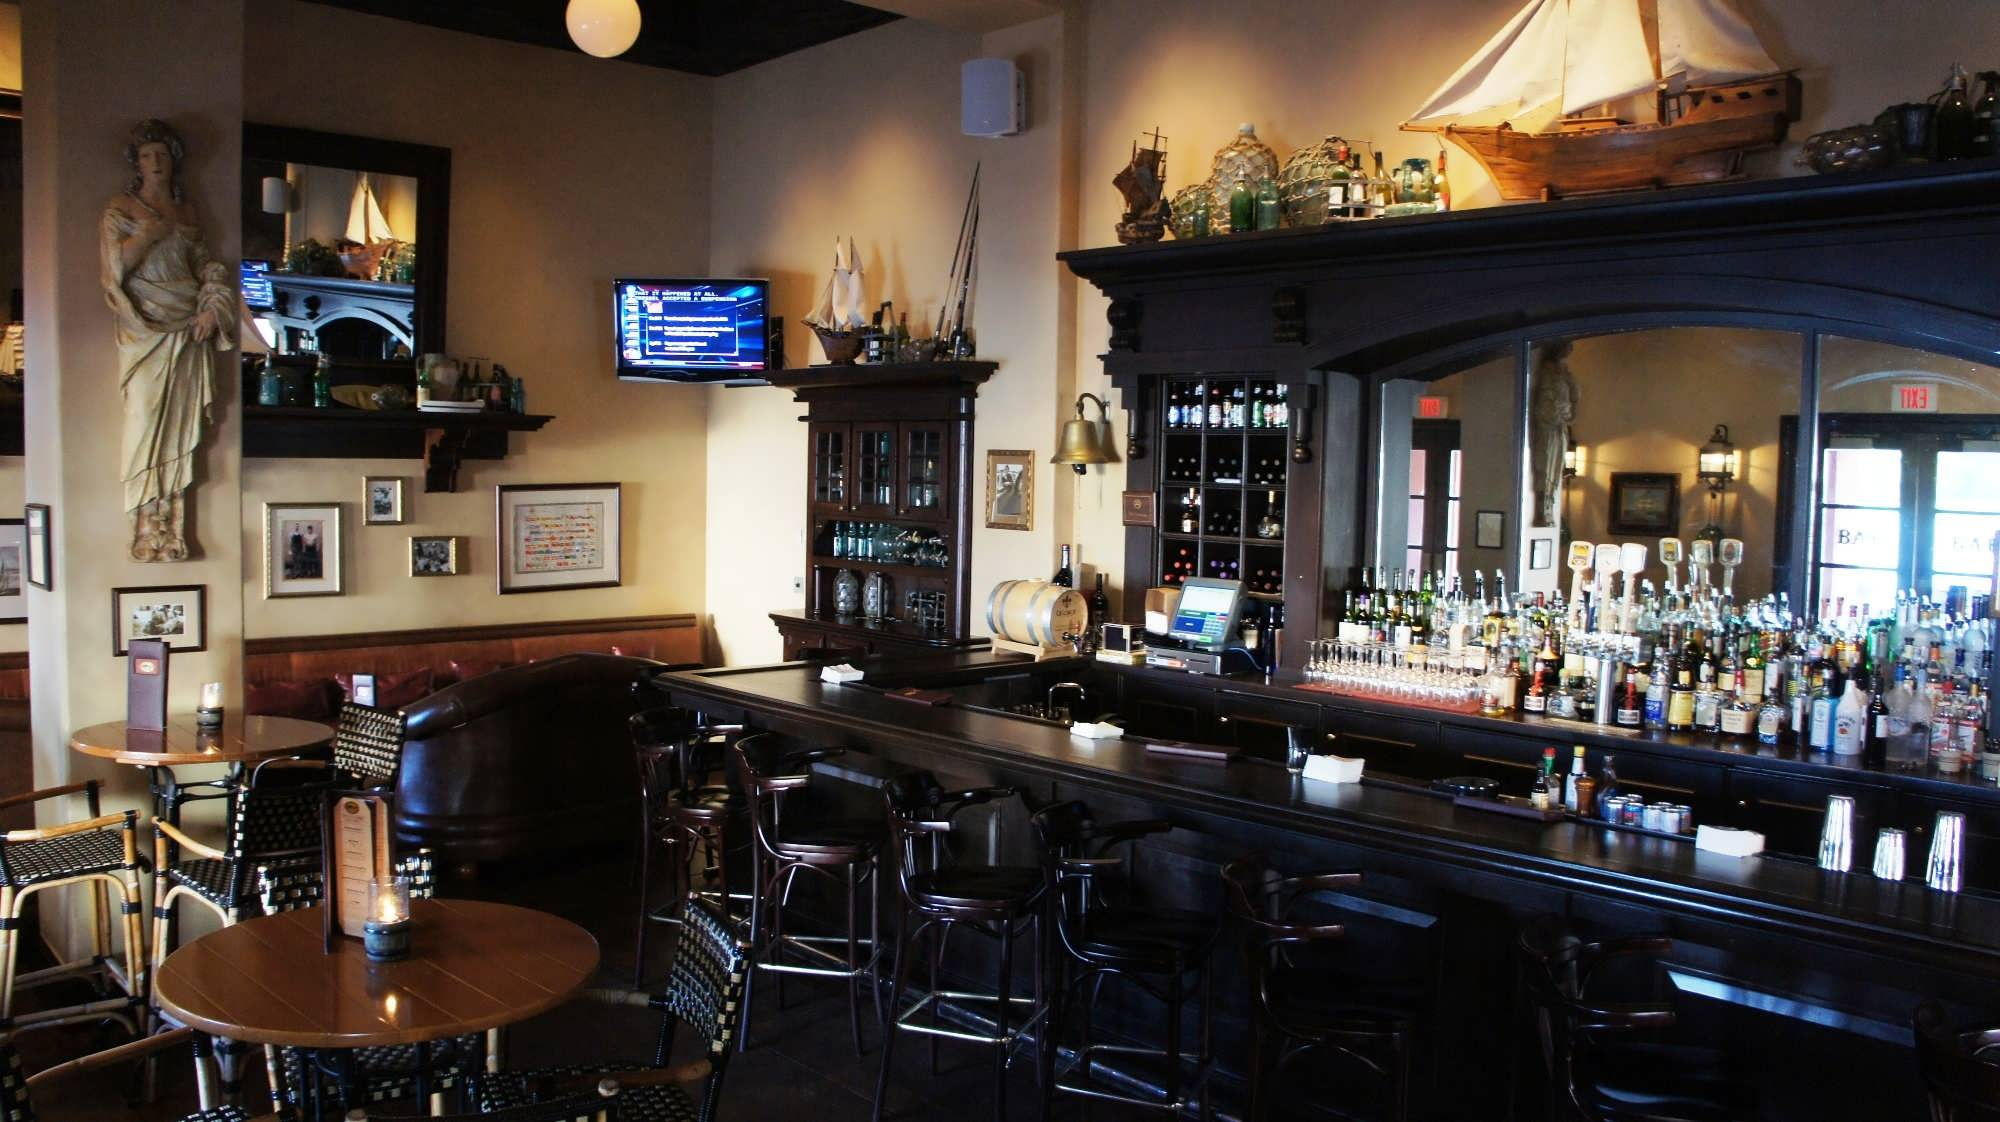 The Thirsty Fish Bar at Portofino Bay Hotel